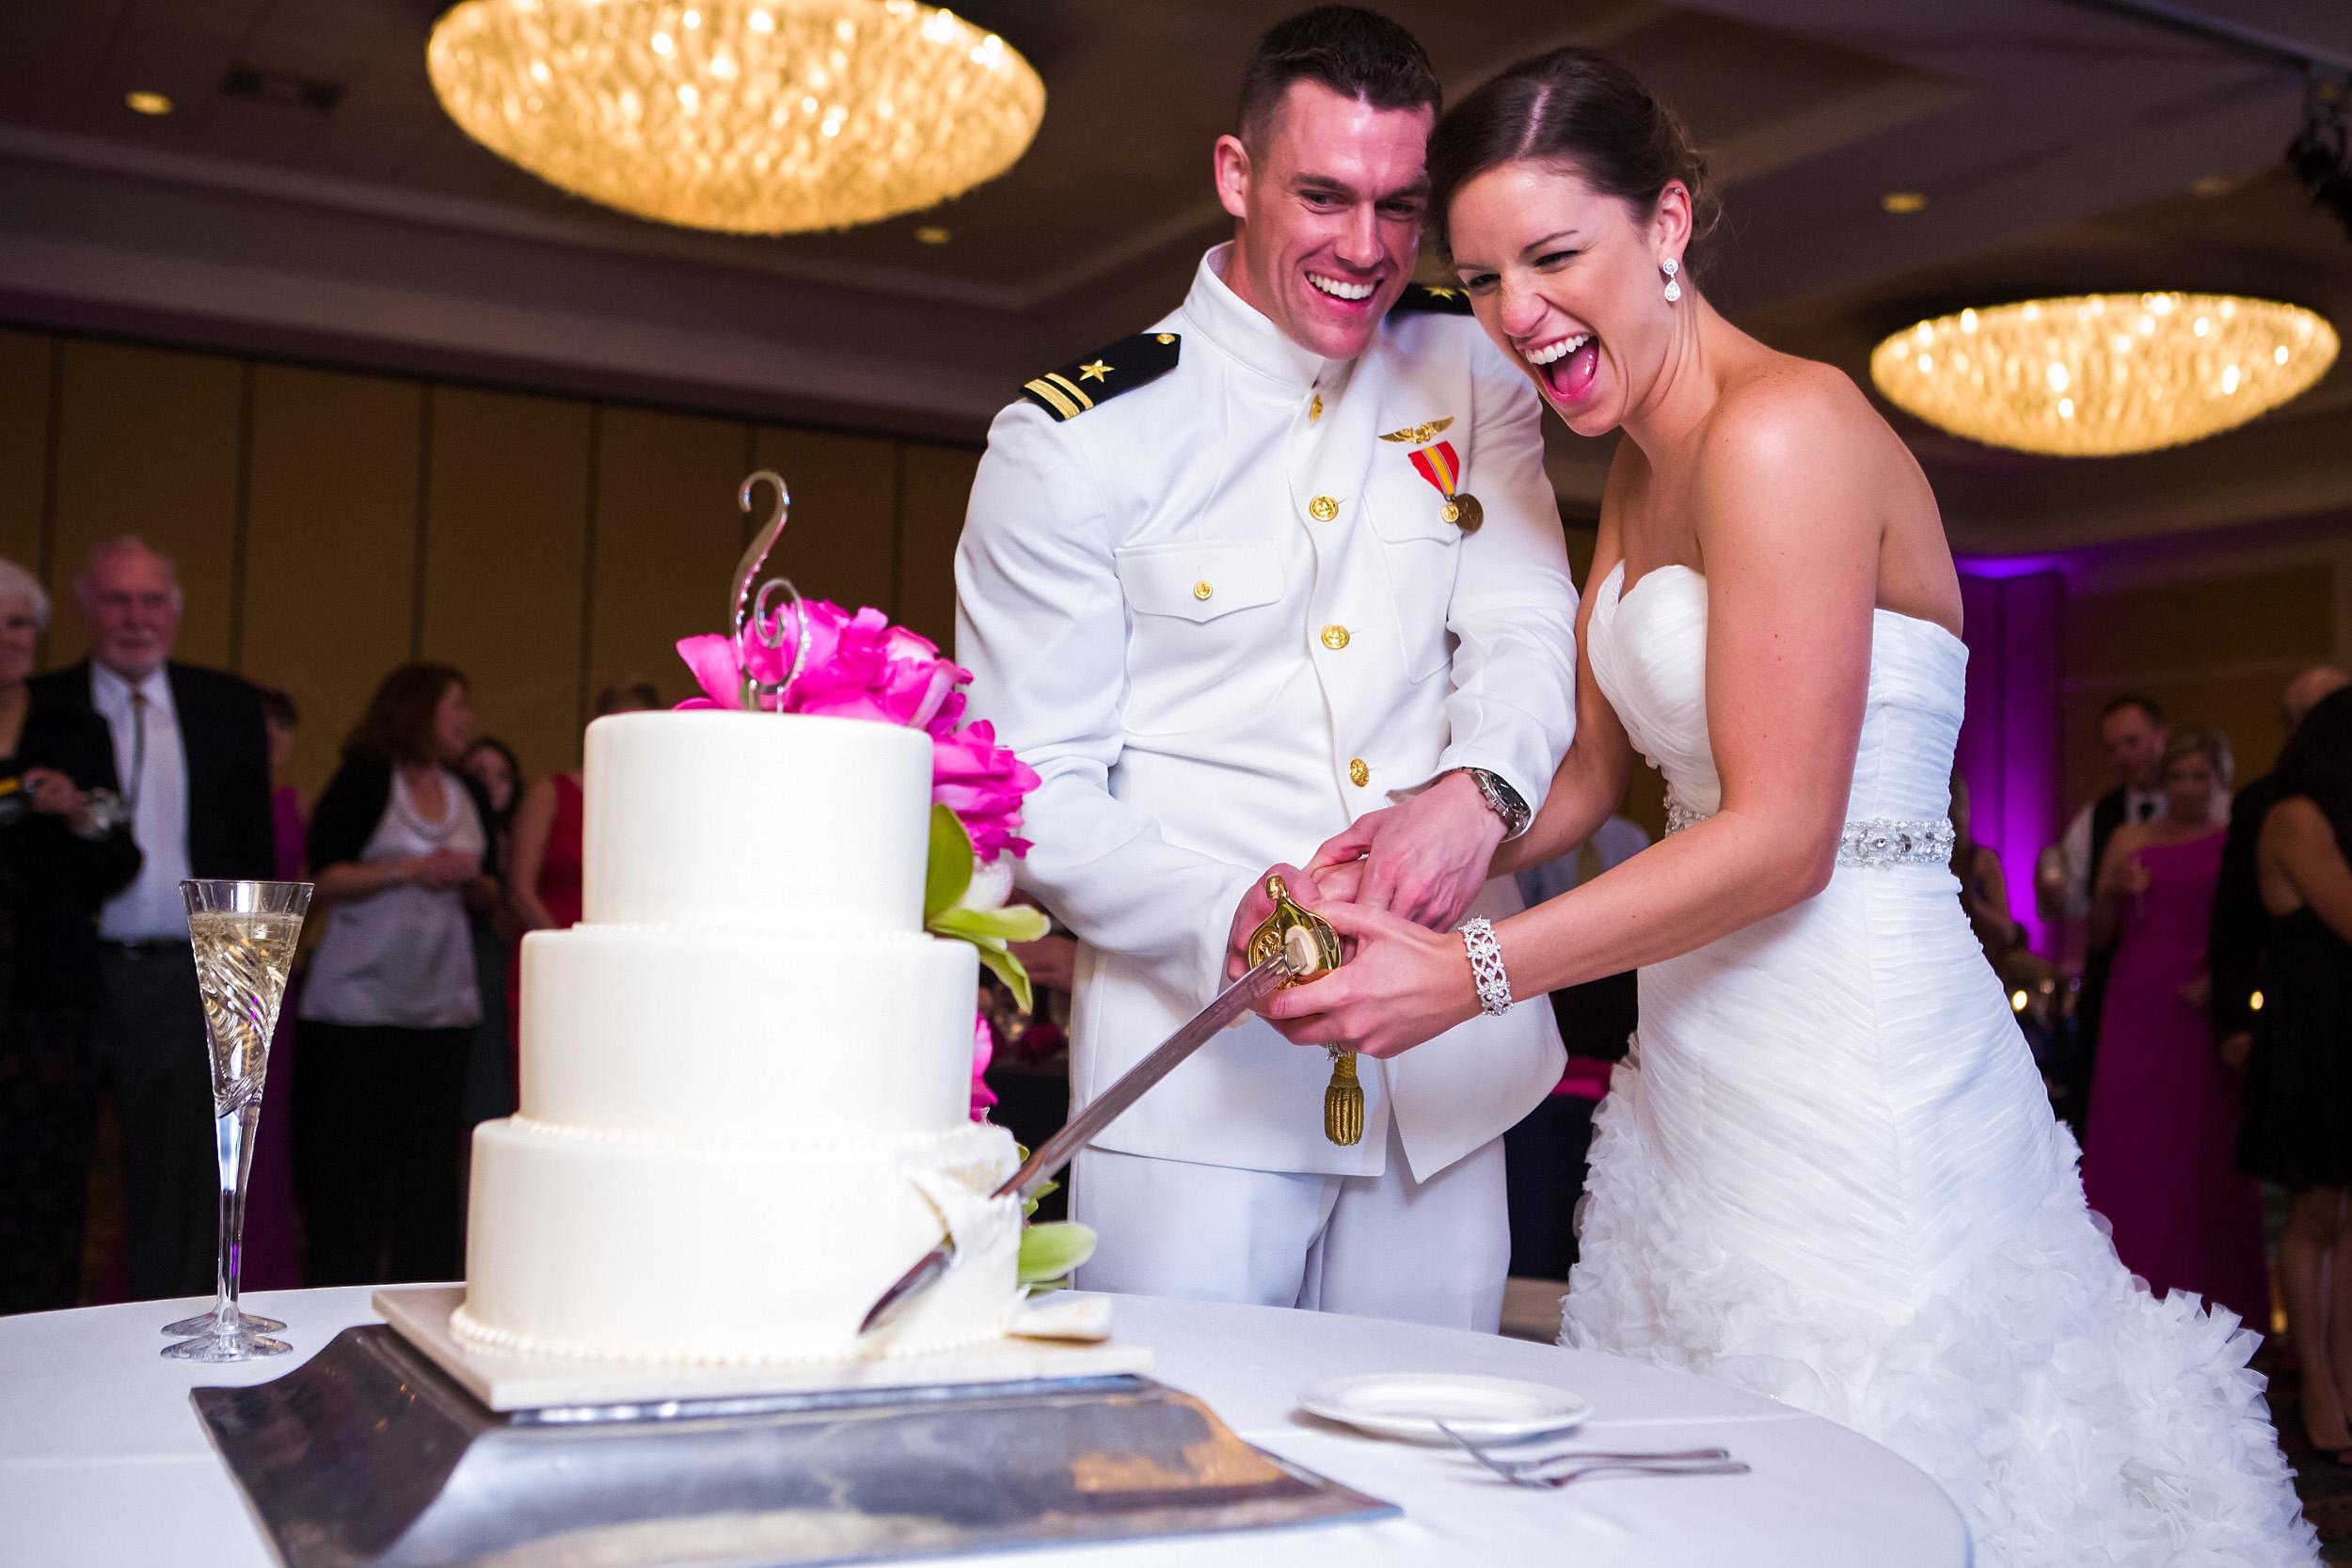 austin-wedding-mike-reed-8.jpg